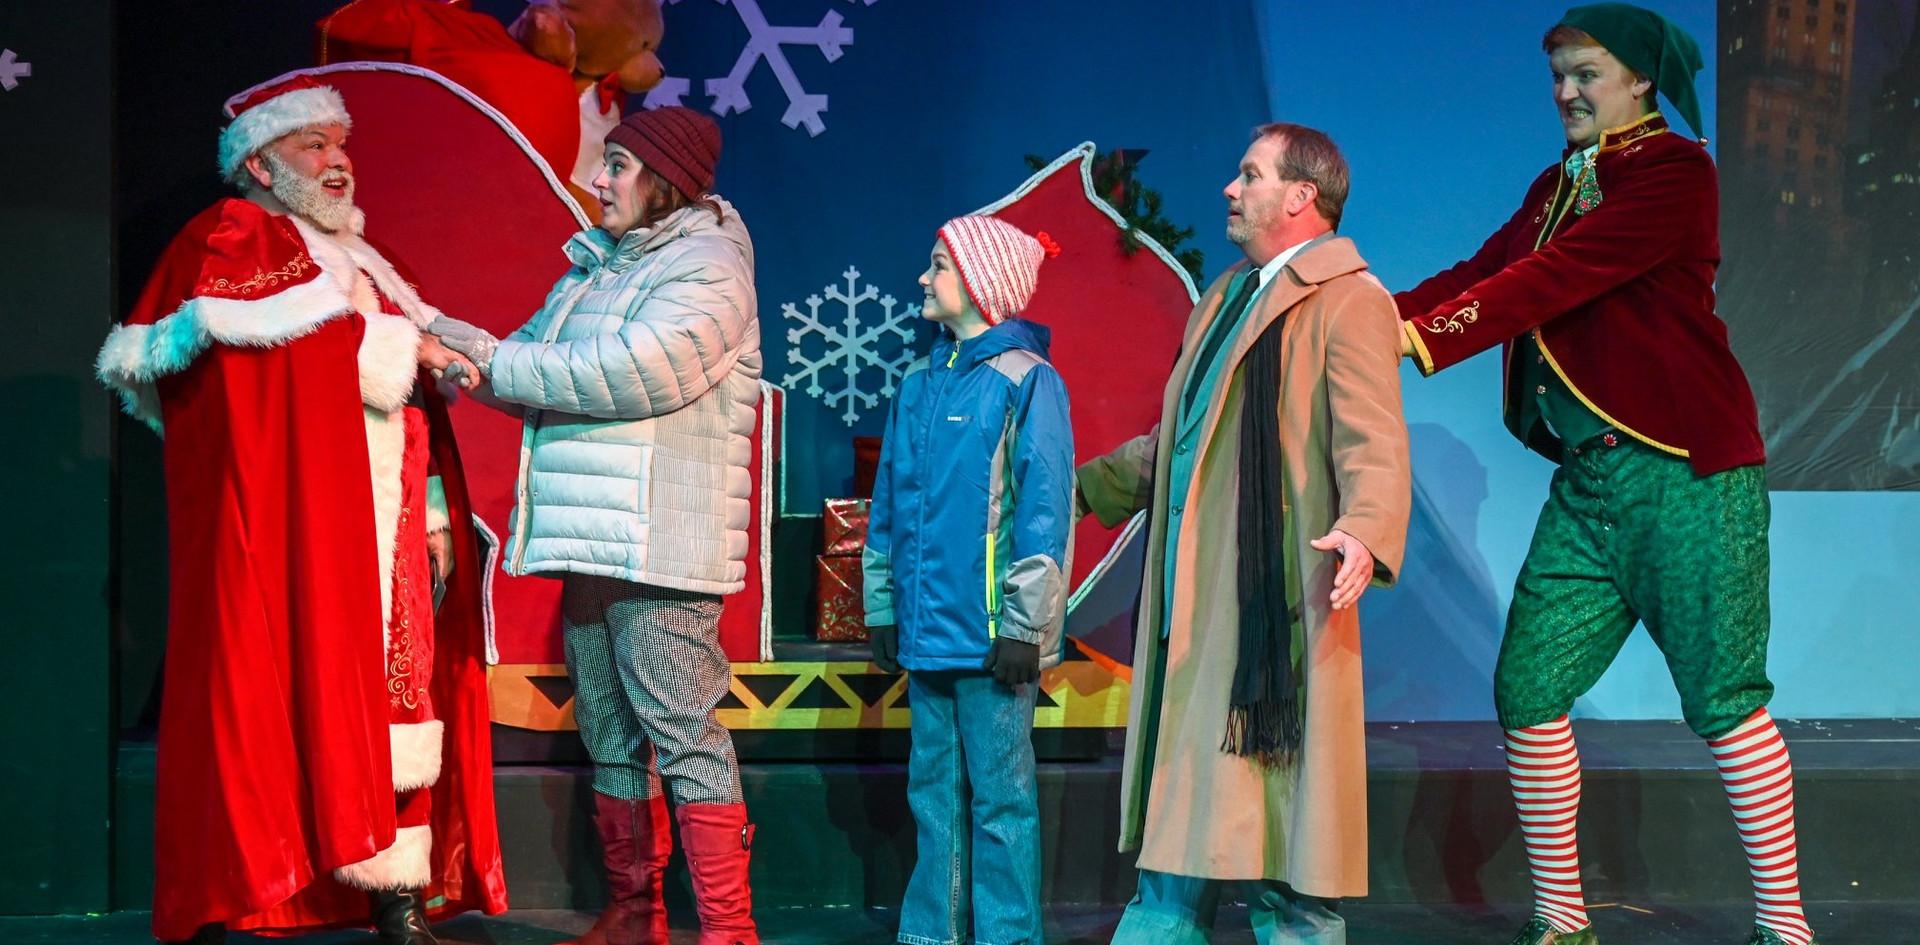 Santa: Daryl Berry Emily: Kat Fresh Michael: Trey Rolston Walter: Chris Carroll Buddy: Colby Padgett